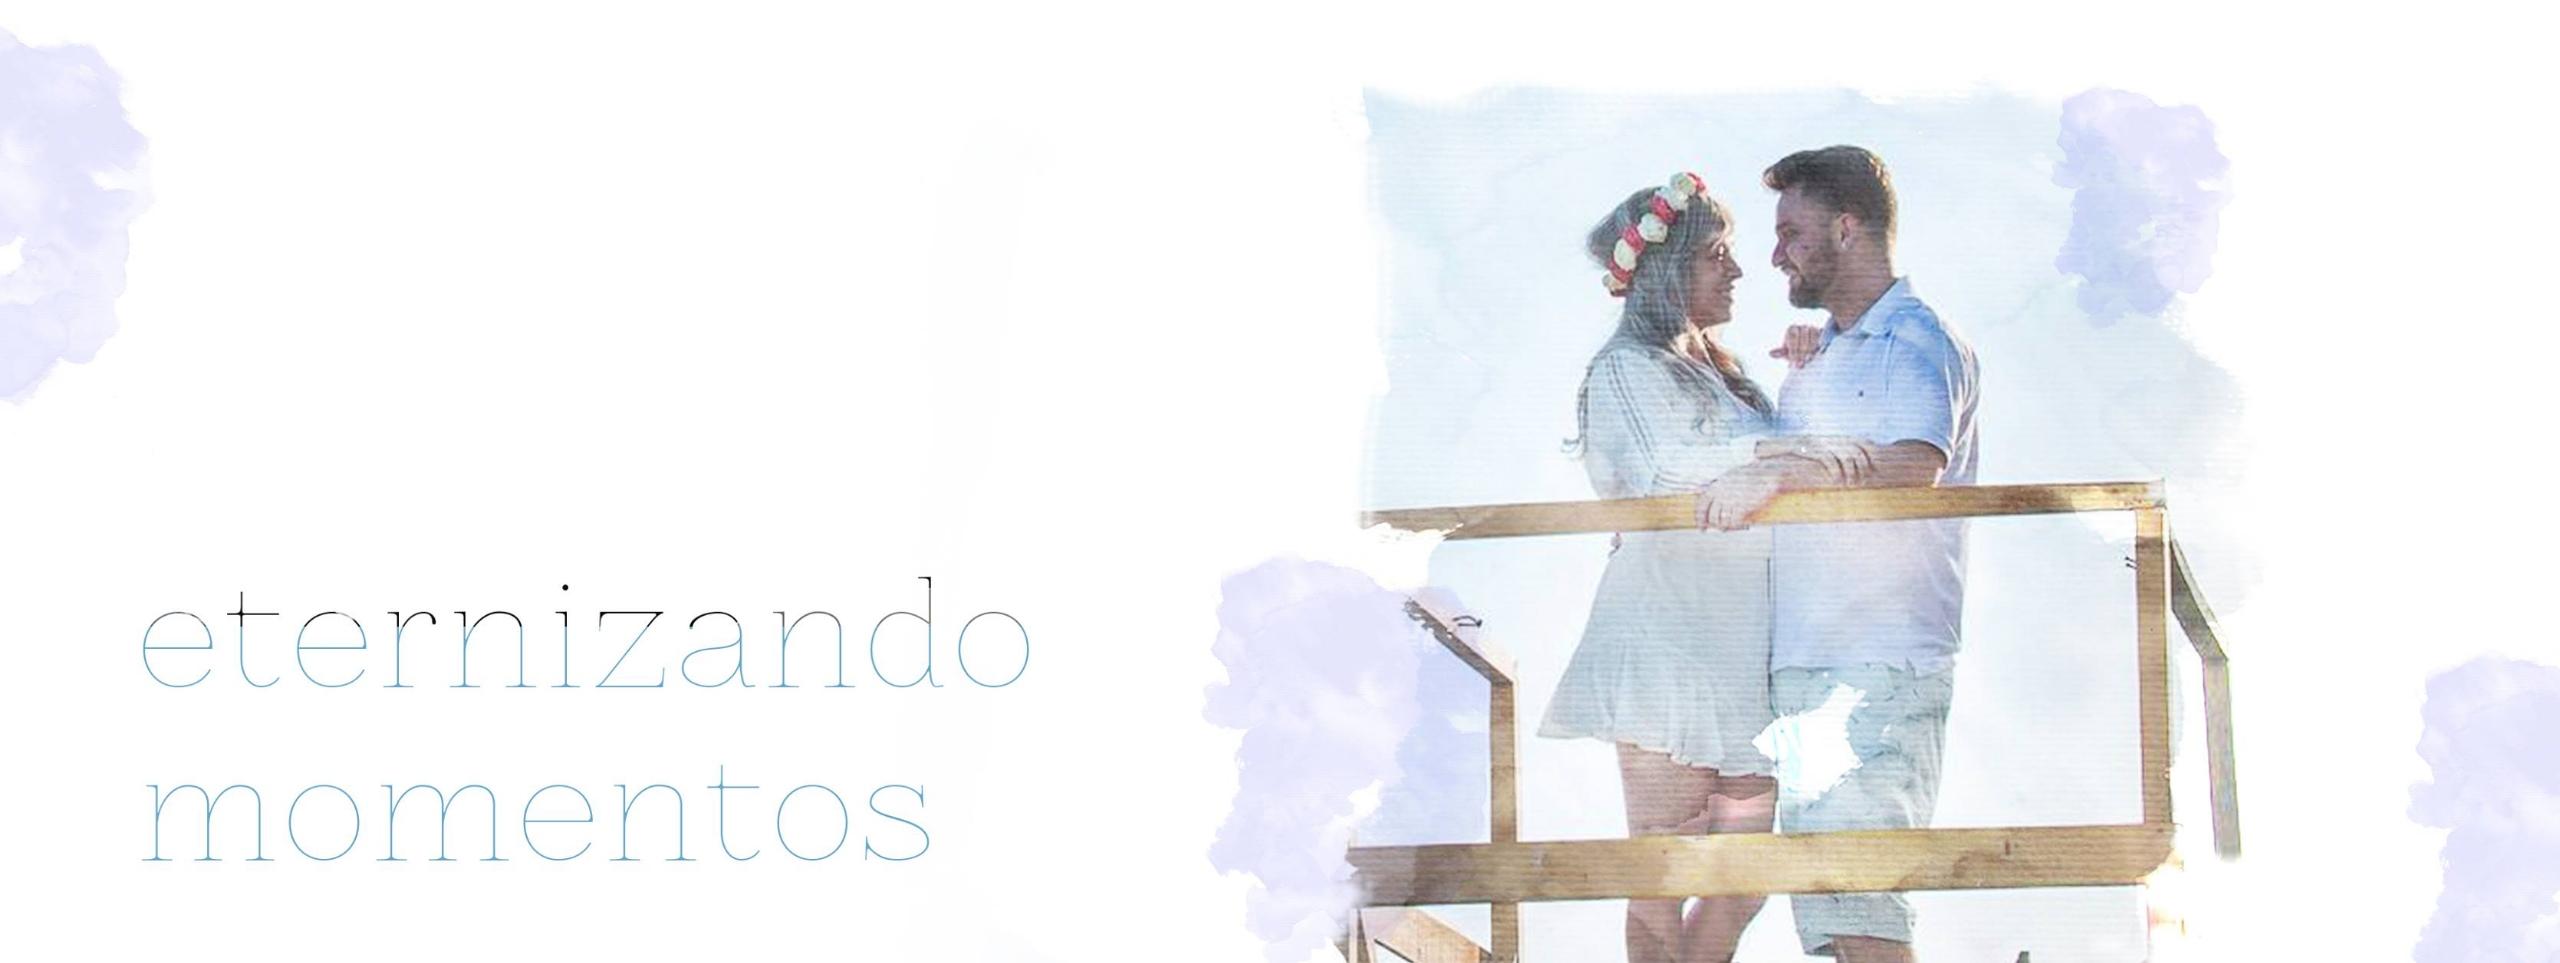 André Luis Fotograf (@andreluisfotografia) Cover Image